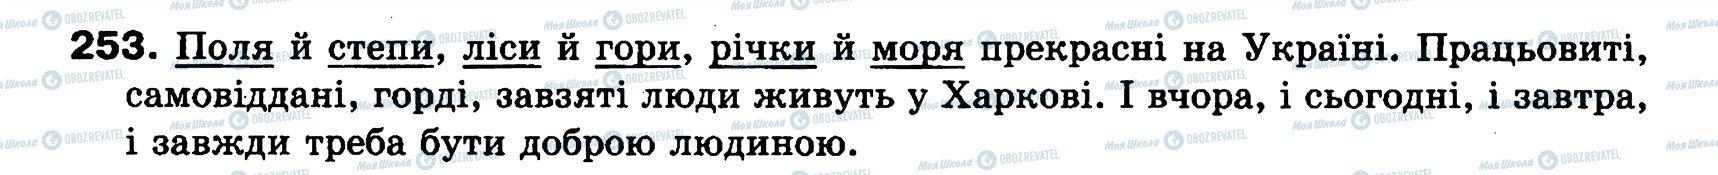 ГДЗ Укр мова 8 класс страница 253